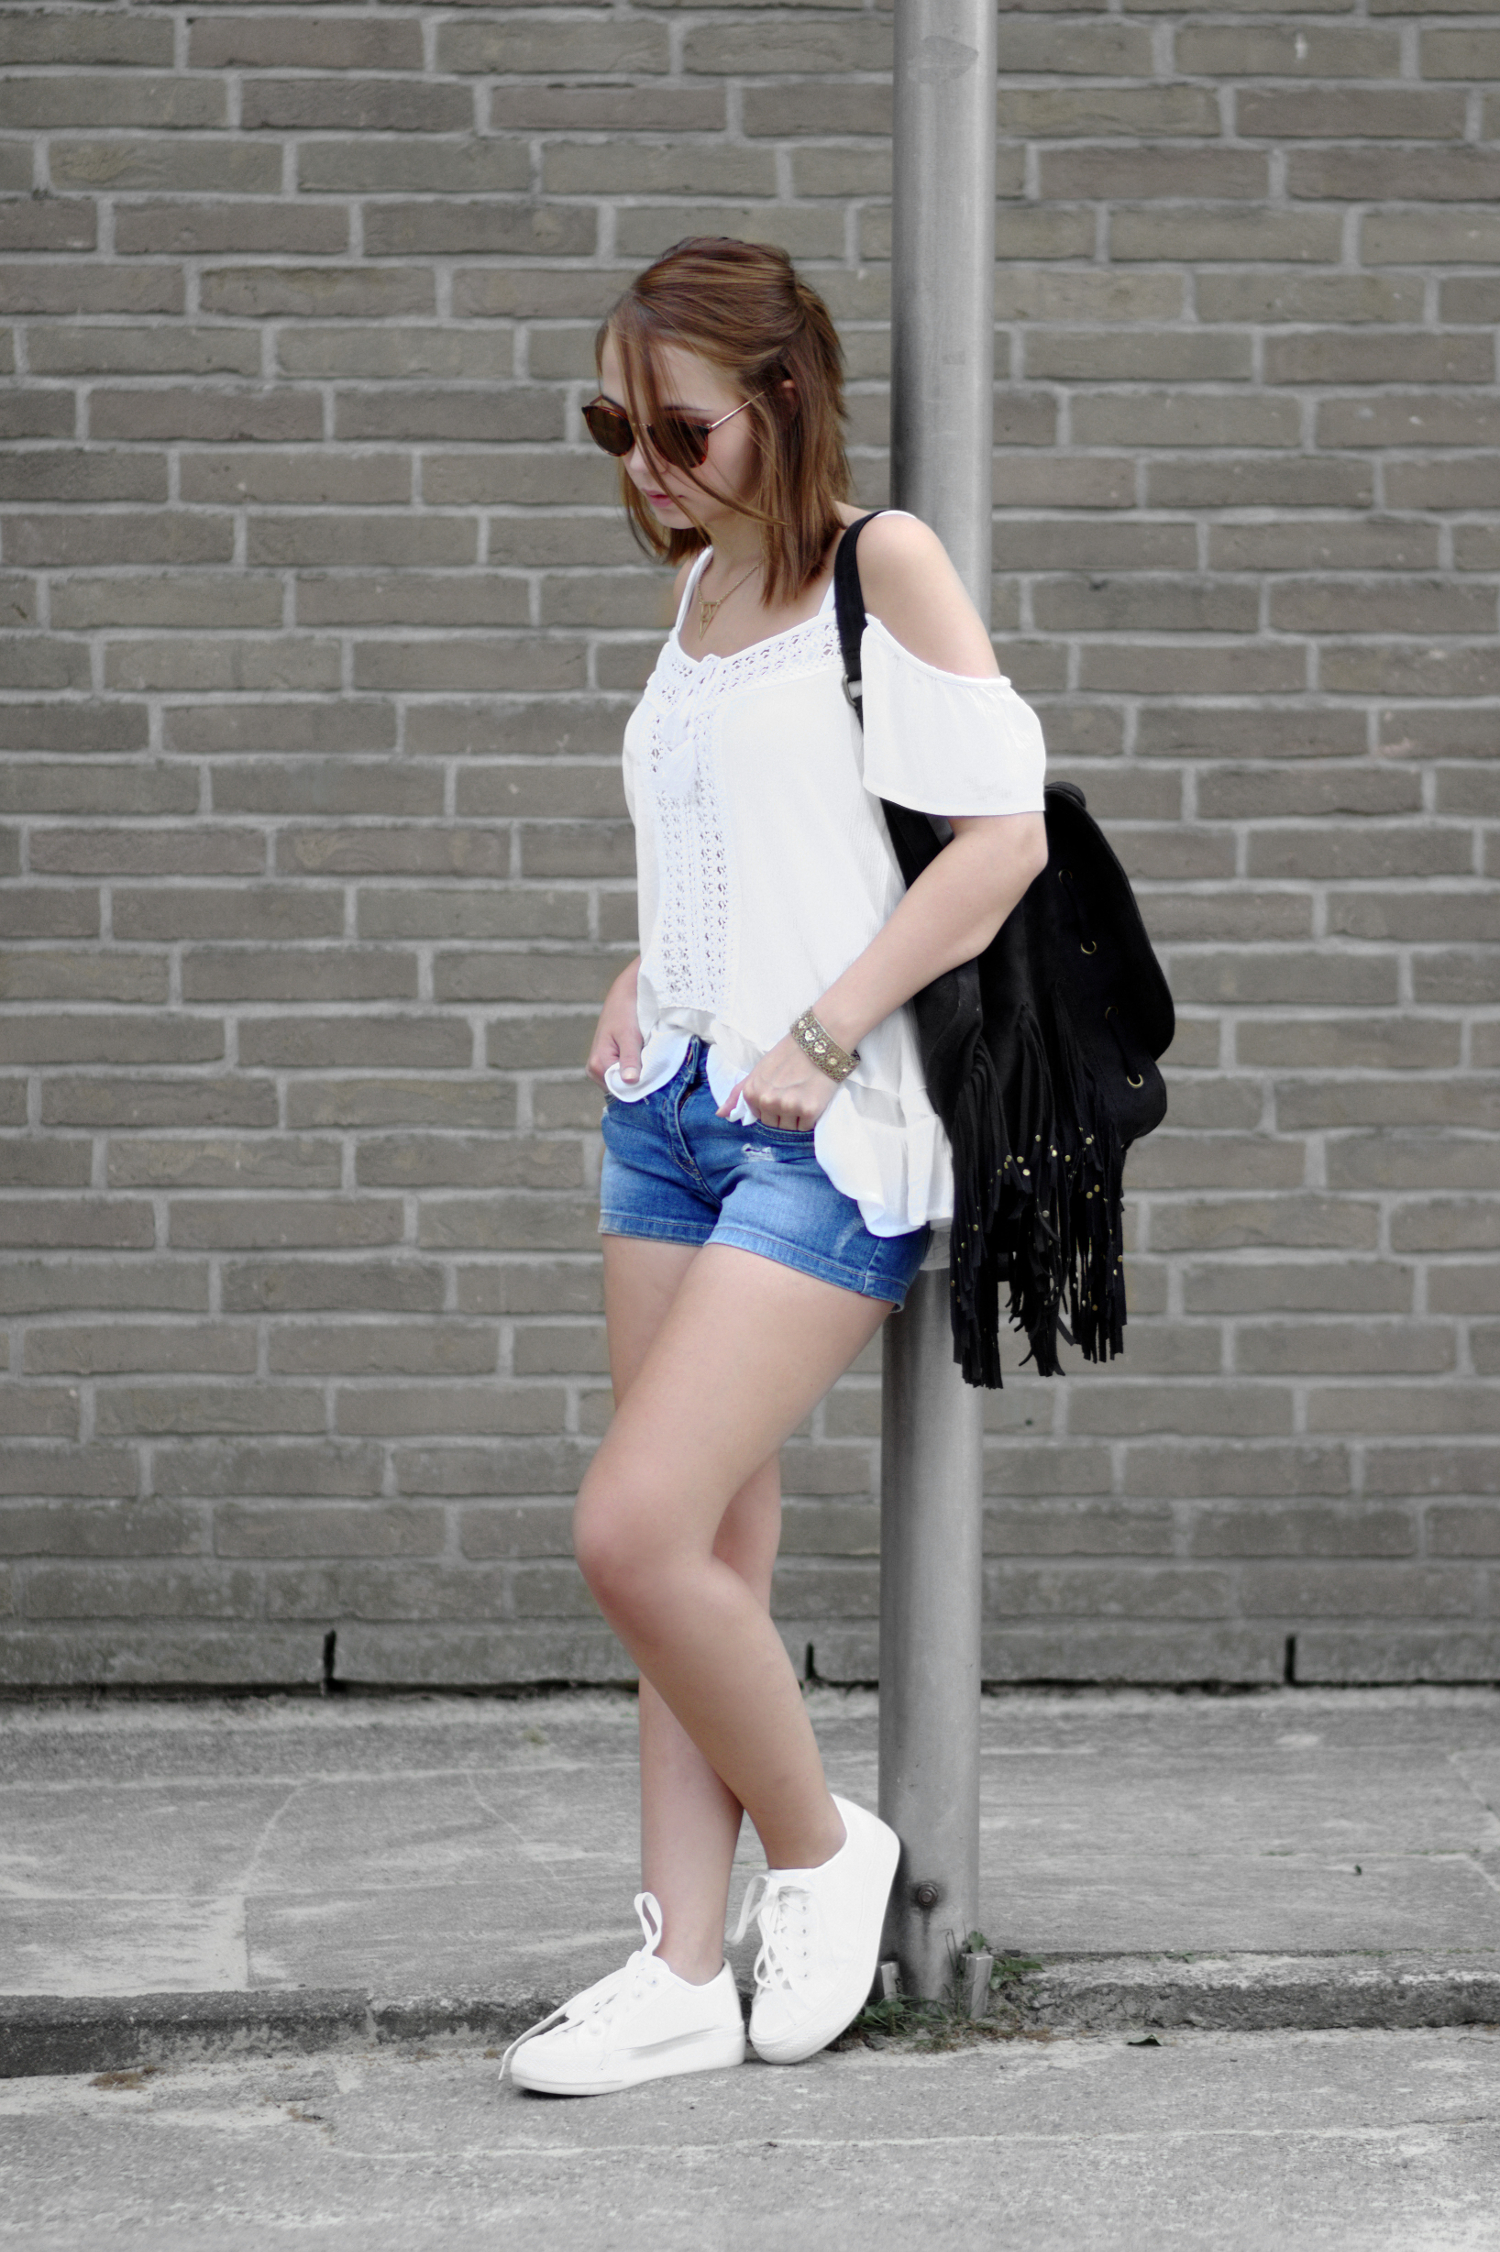 Bezaubernde Nana, bezauberndenana.de, Sommer Outfit mit Jeans Shorts, schulterfreies Oberteil, Off Shoulder, Plateau Sneaker, sportliches Outfit, Streetstyle